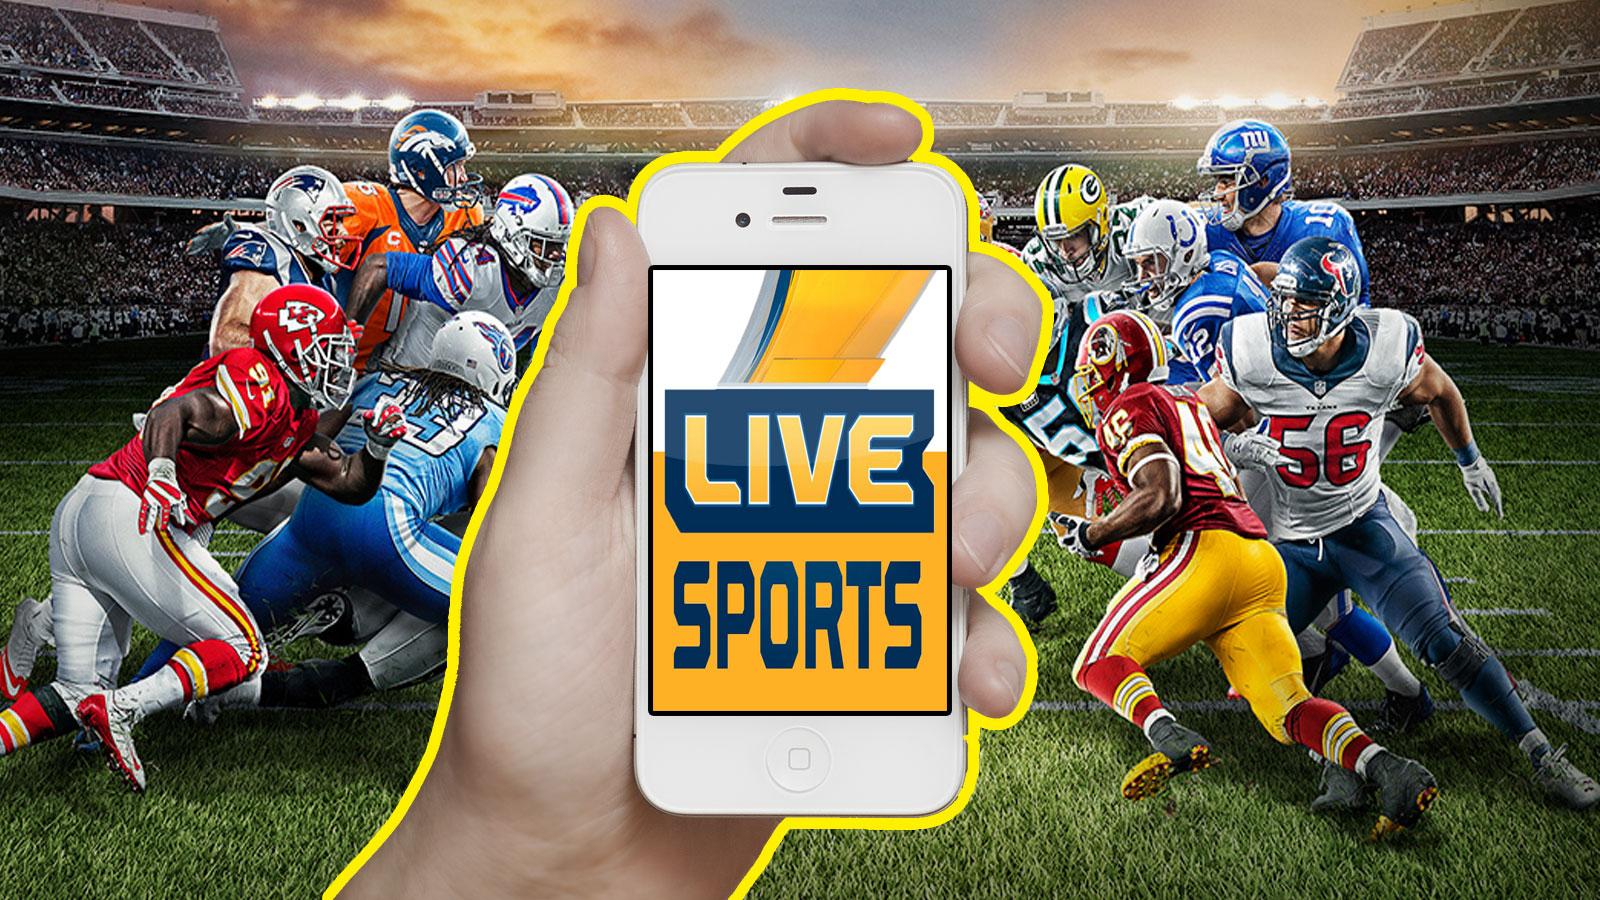 Sports stream